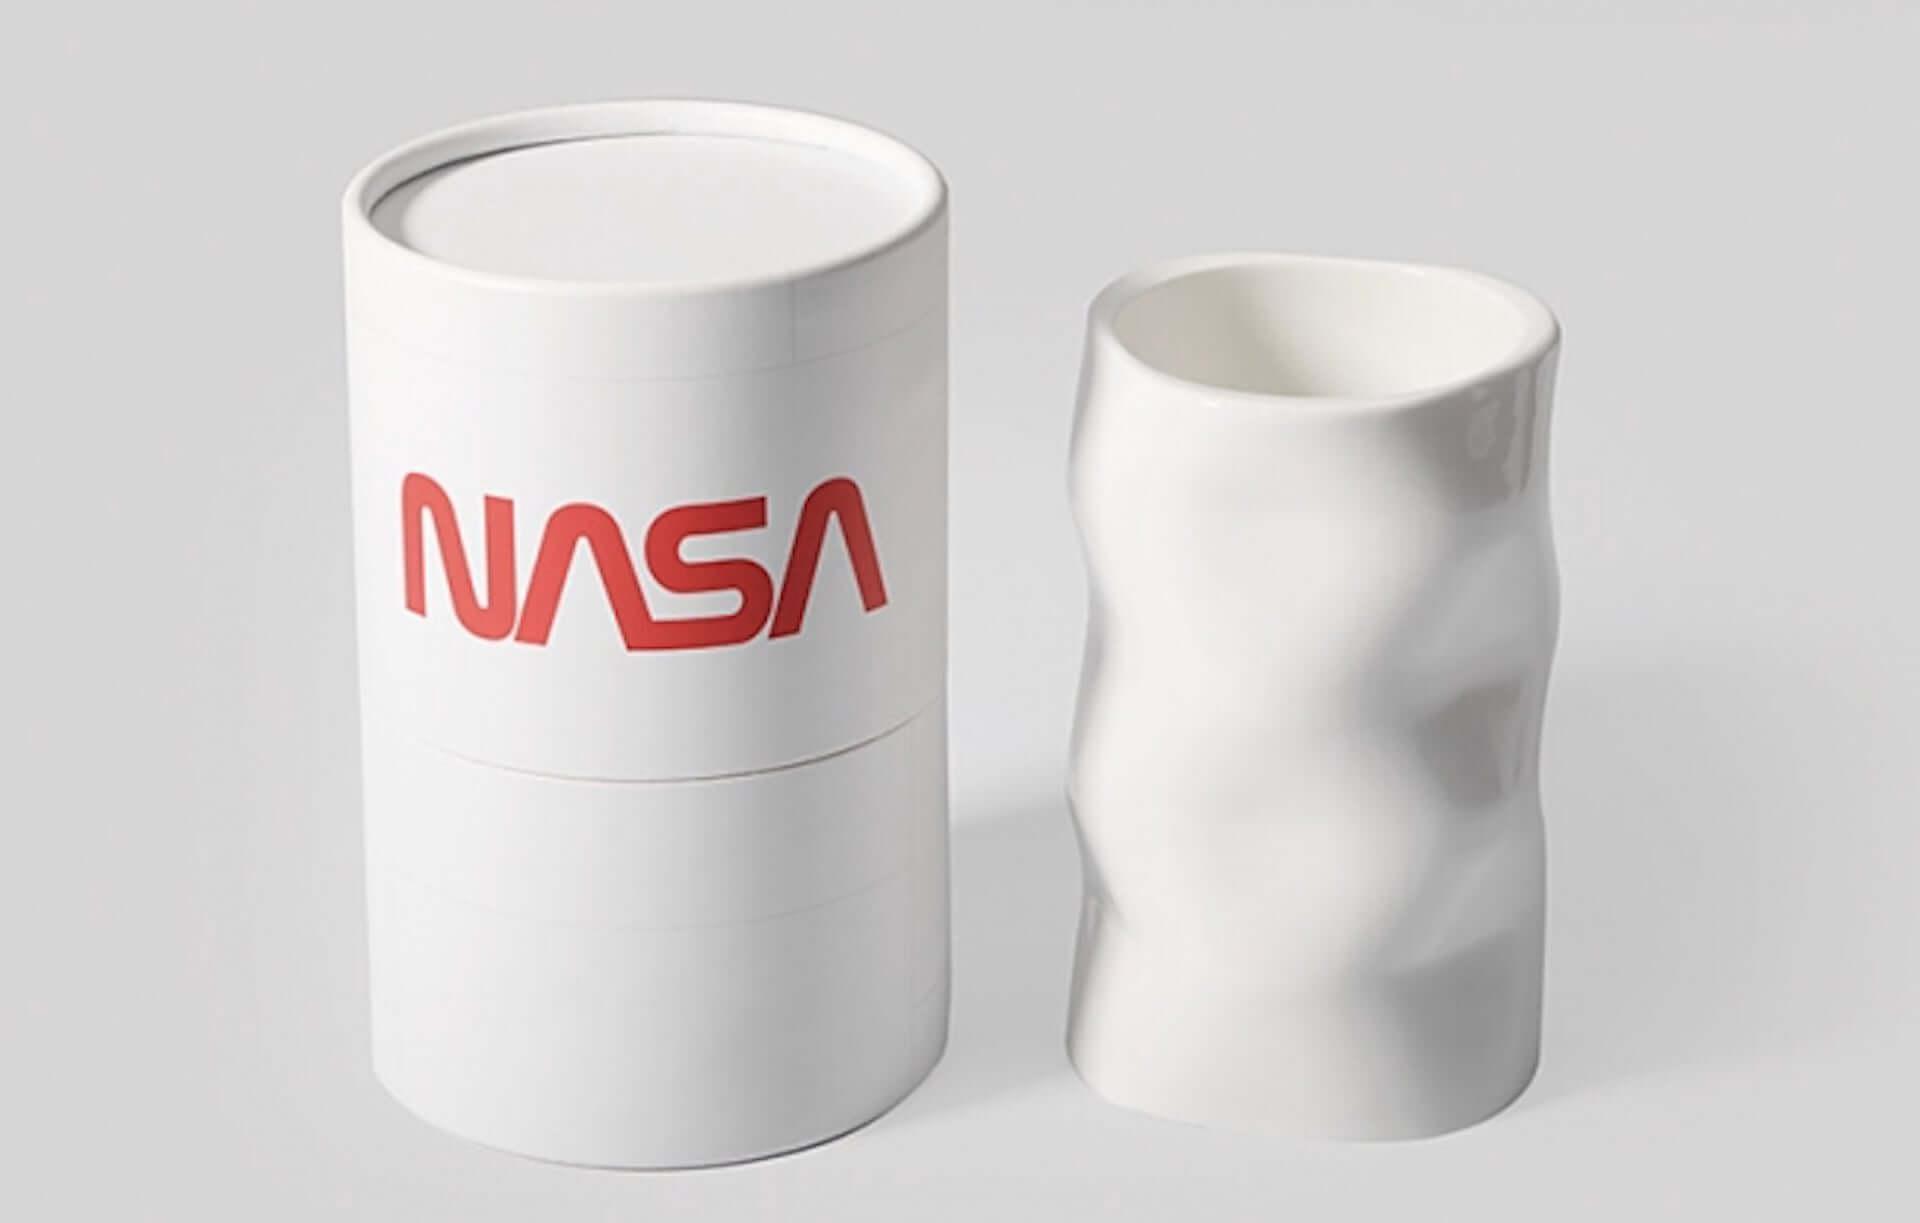 NASA公認&設立60周年記念のARマグカップ!宇宙船からの眺めを体験できる『Space Mug』がGLOTURE.JPに再入荷 tech200729_gloture_9-1920x1223